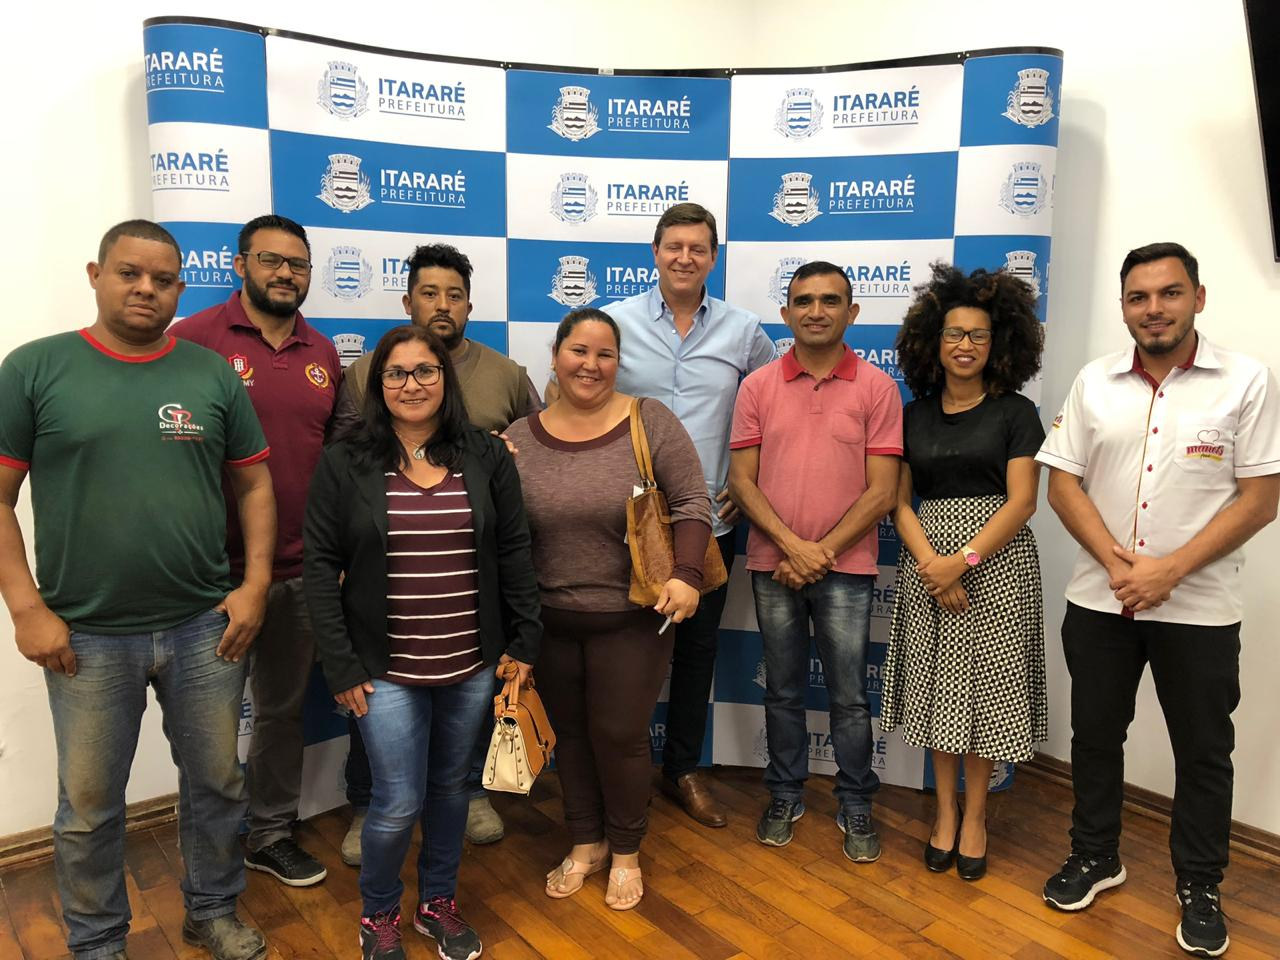 Prefeitura de Itararé (SP) recepciona líderes de bairros do município